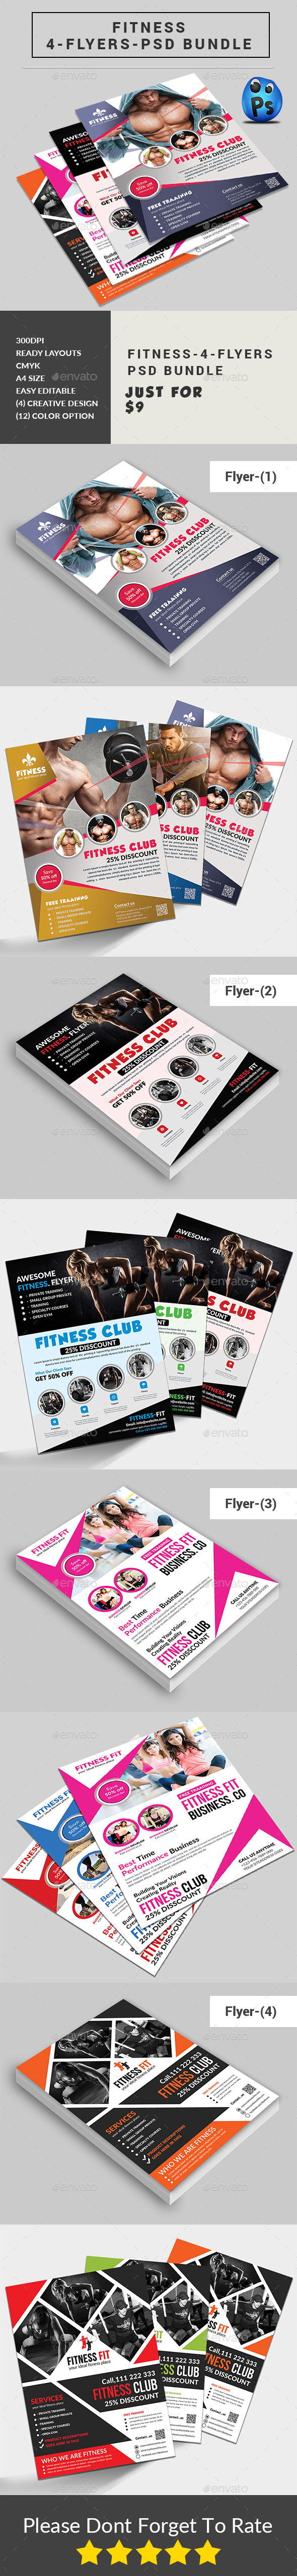 Health, Sports, Fitness Flyers Bundle